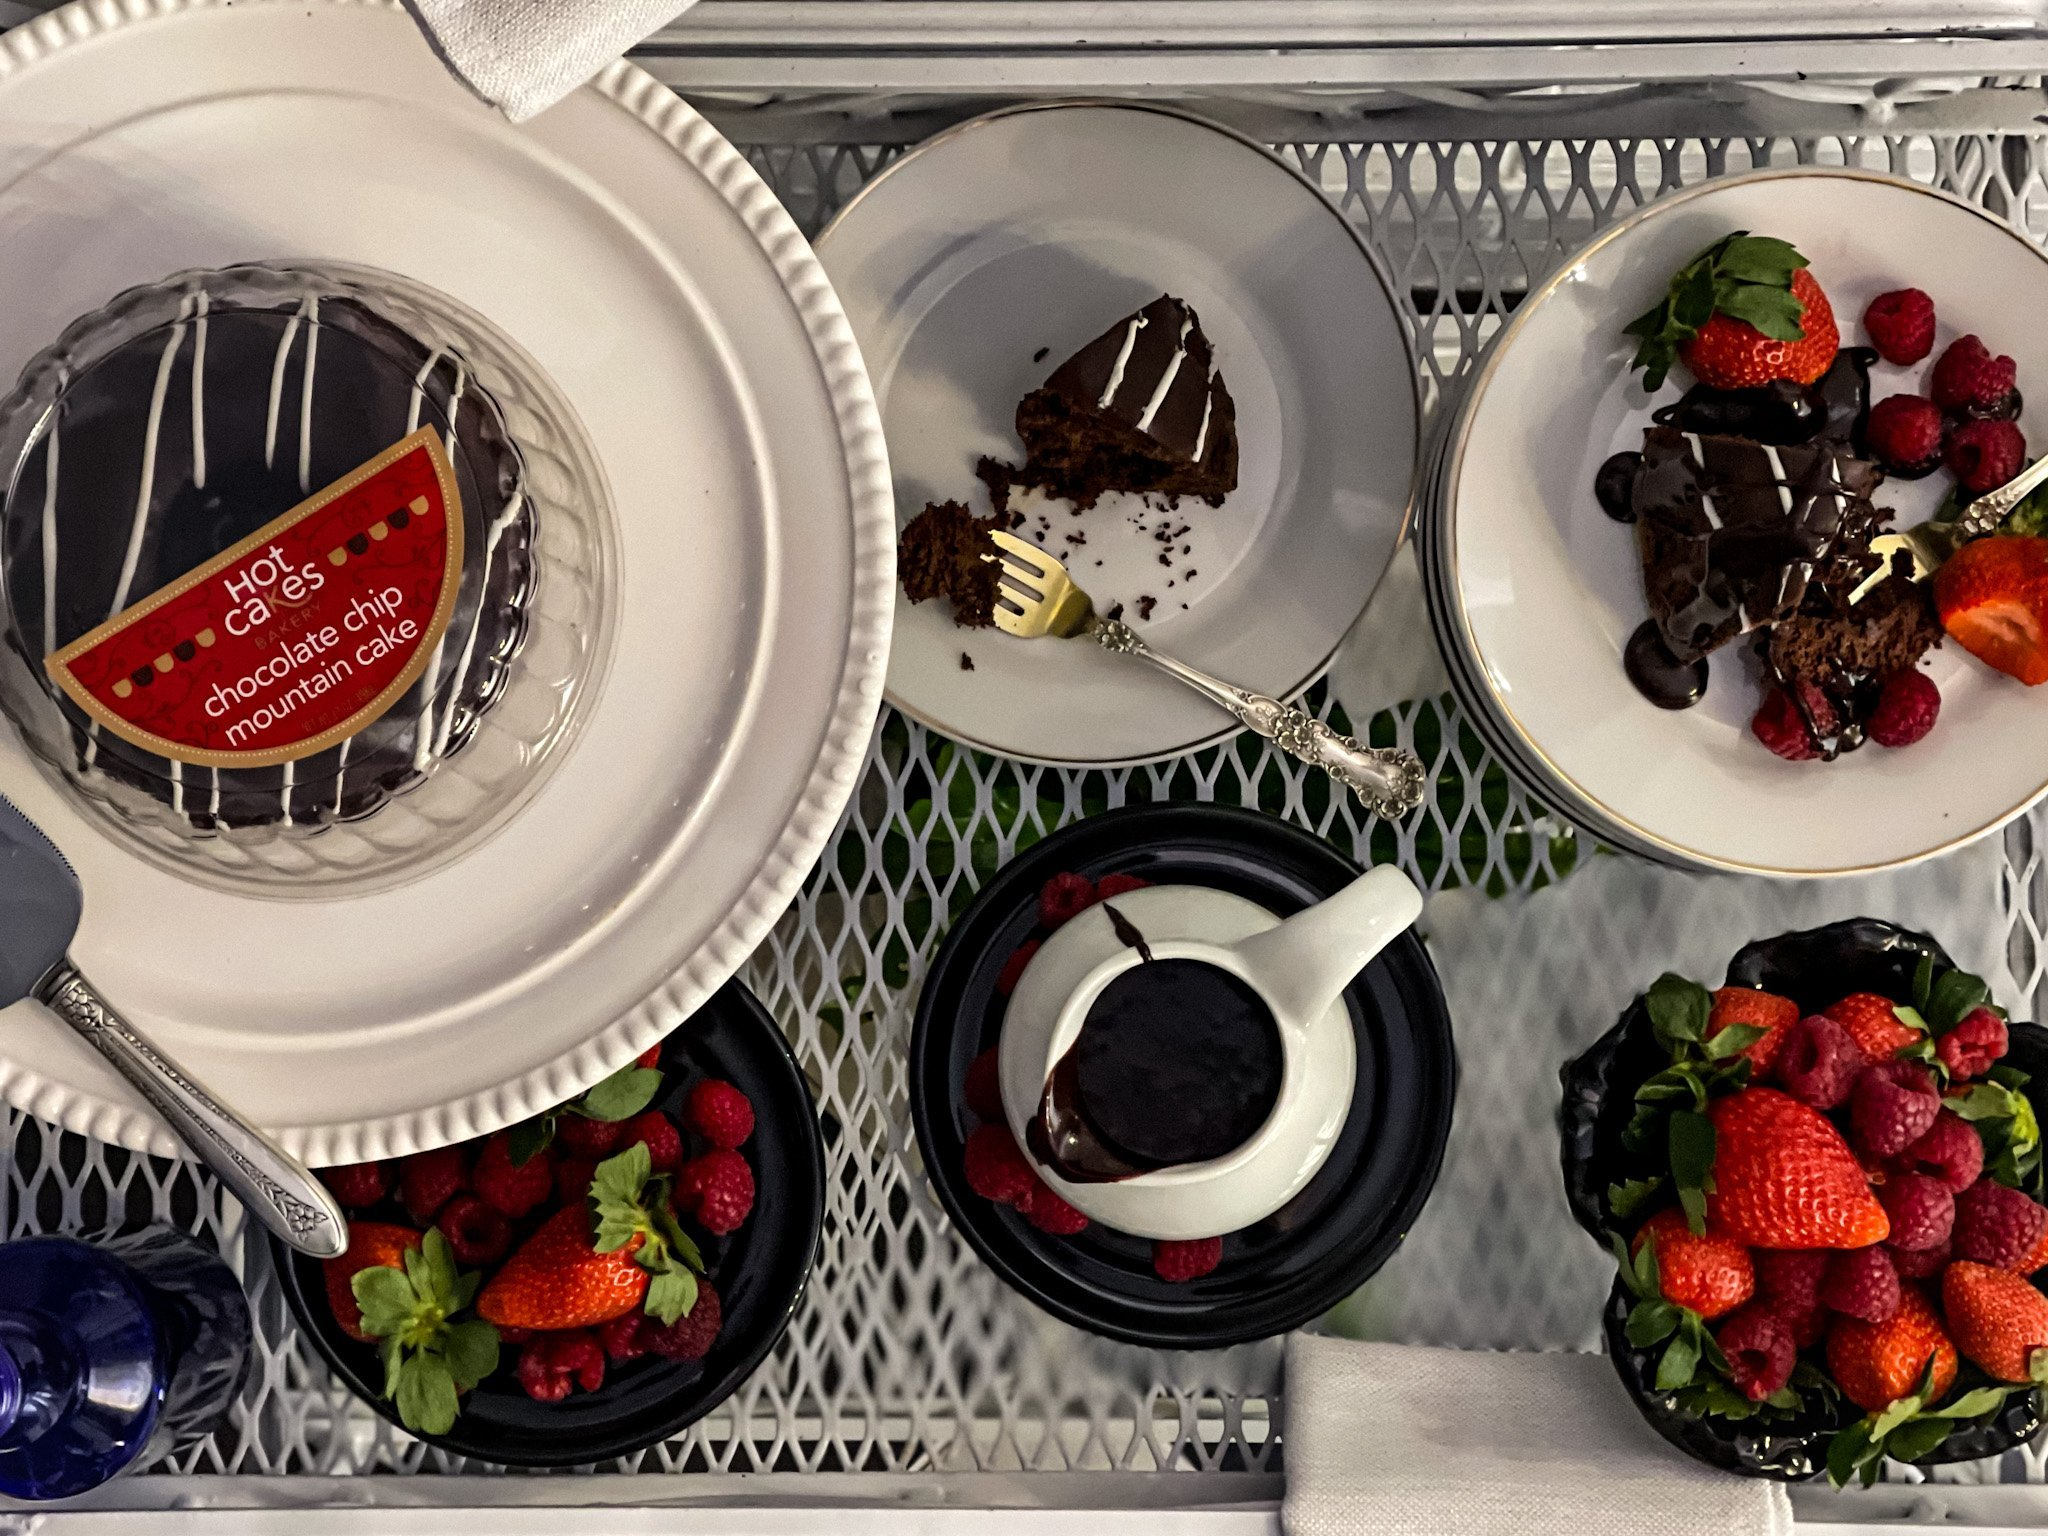 Hot Cakes Bakery - Chocolate Mountain Cake 2